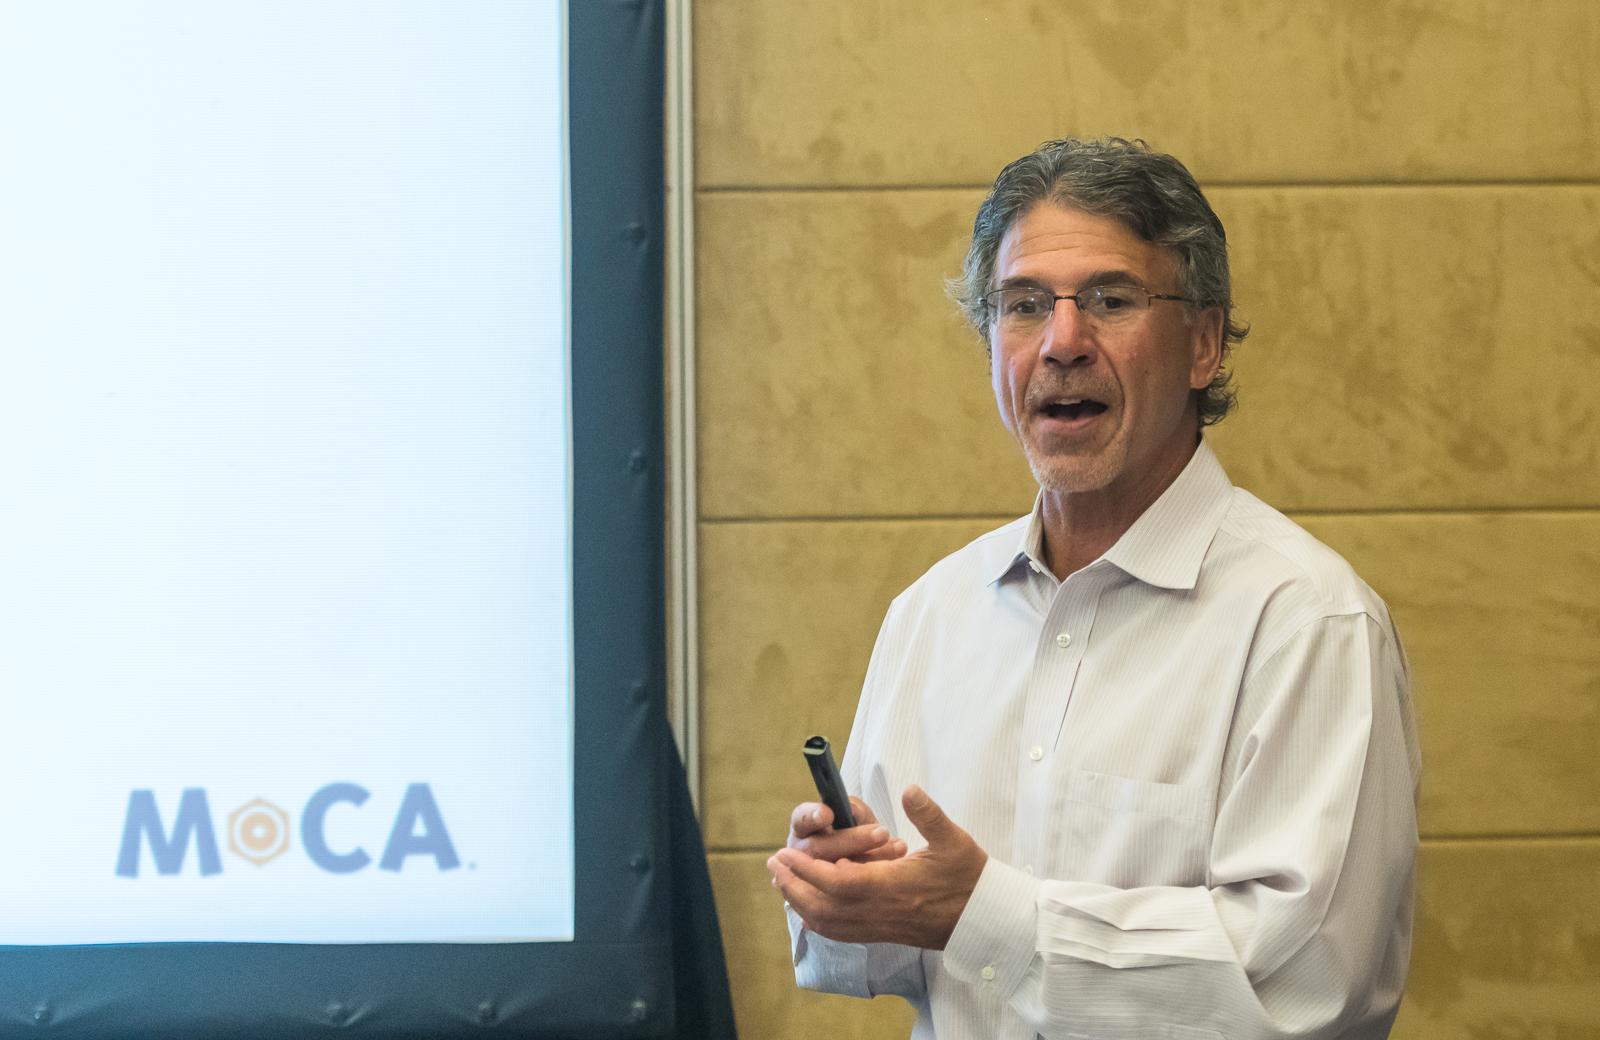 MoCA联盟市场营销及会员关系副总裁 Rob Gelphman 2